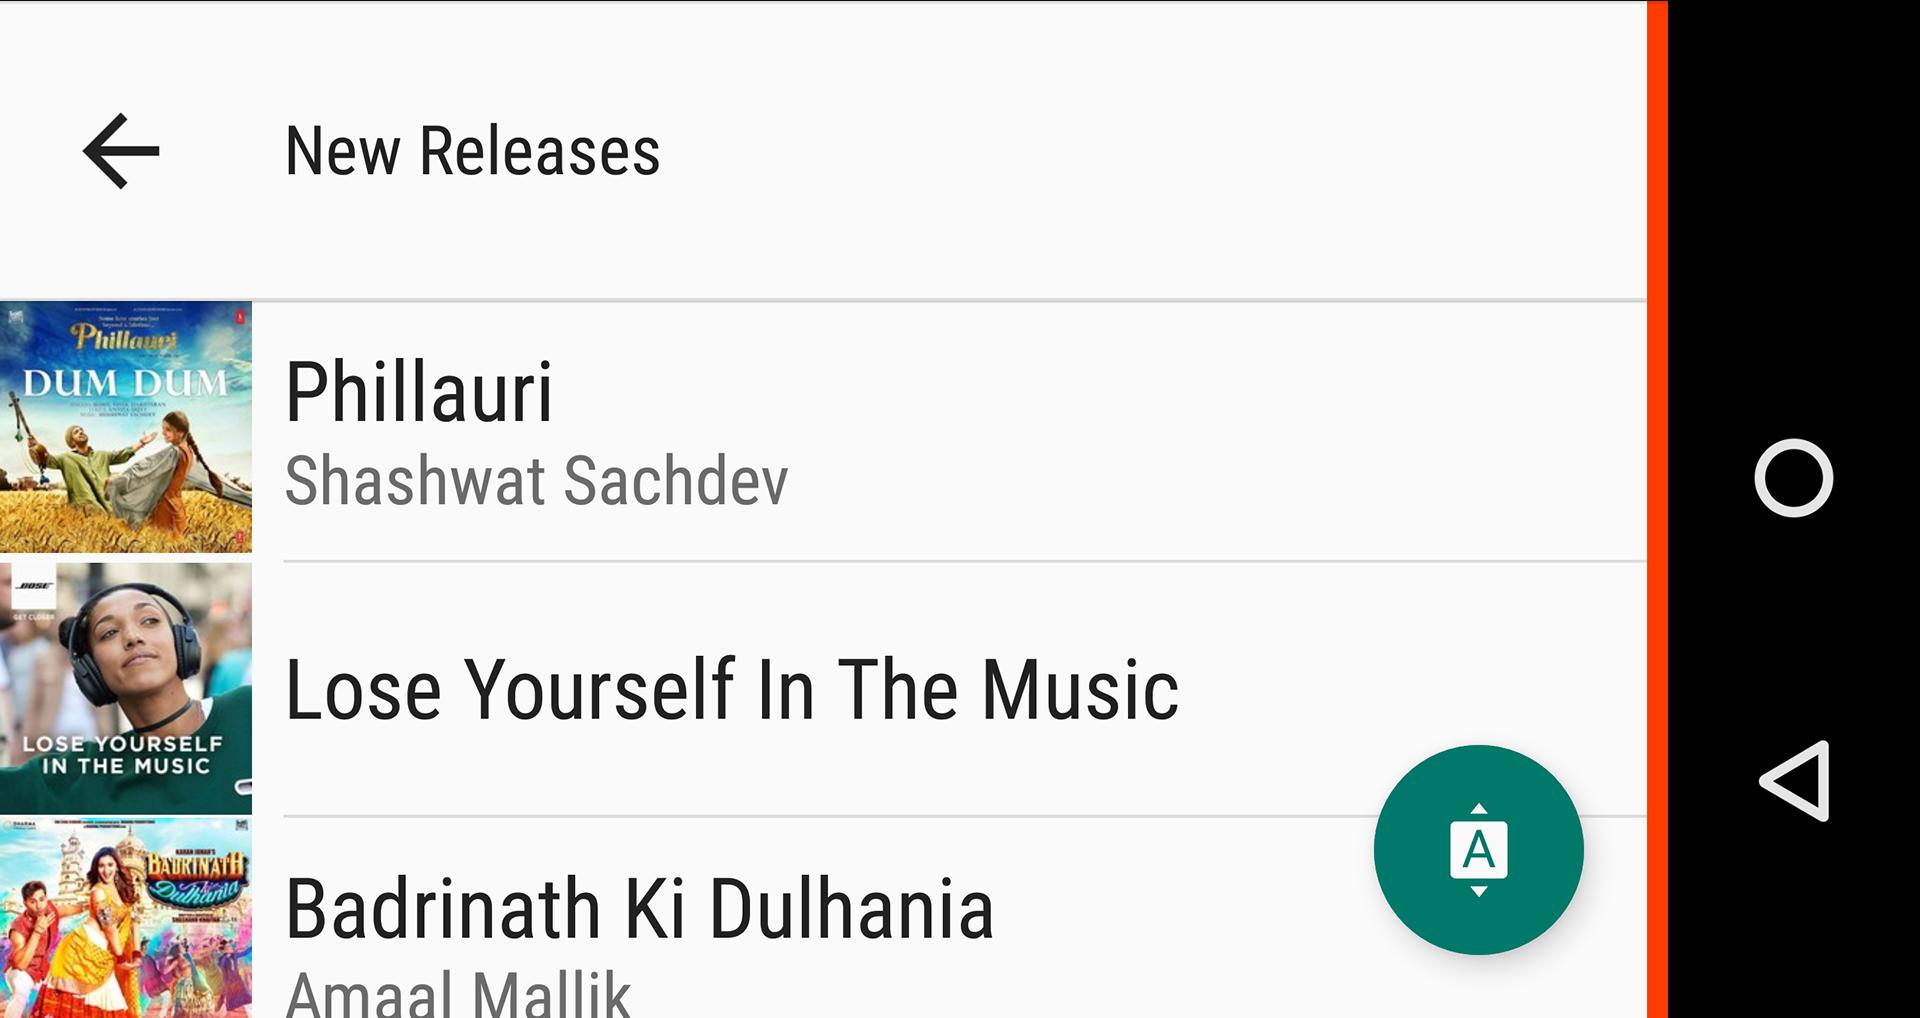 Gaana - Now on Android Auto